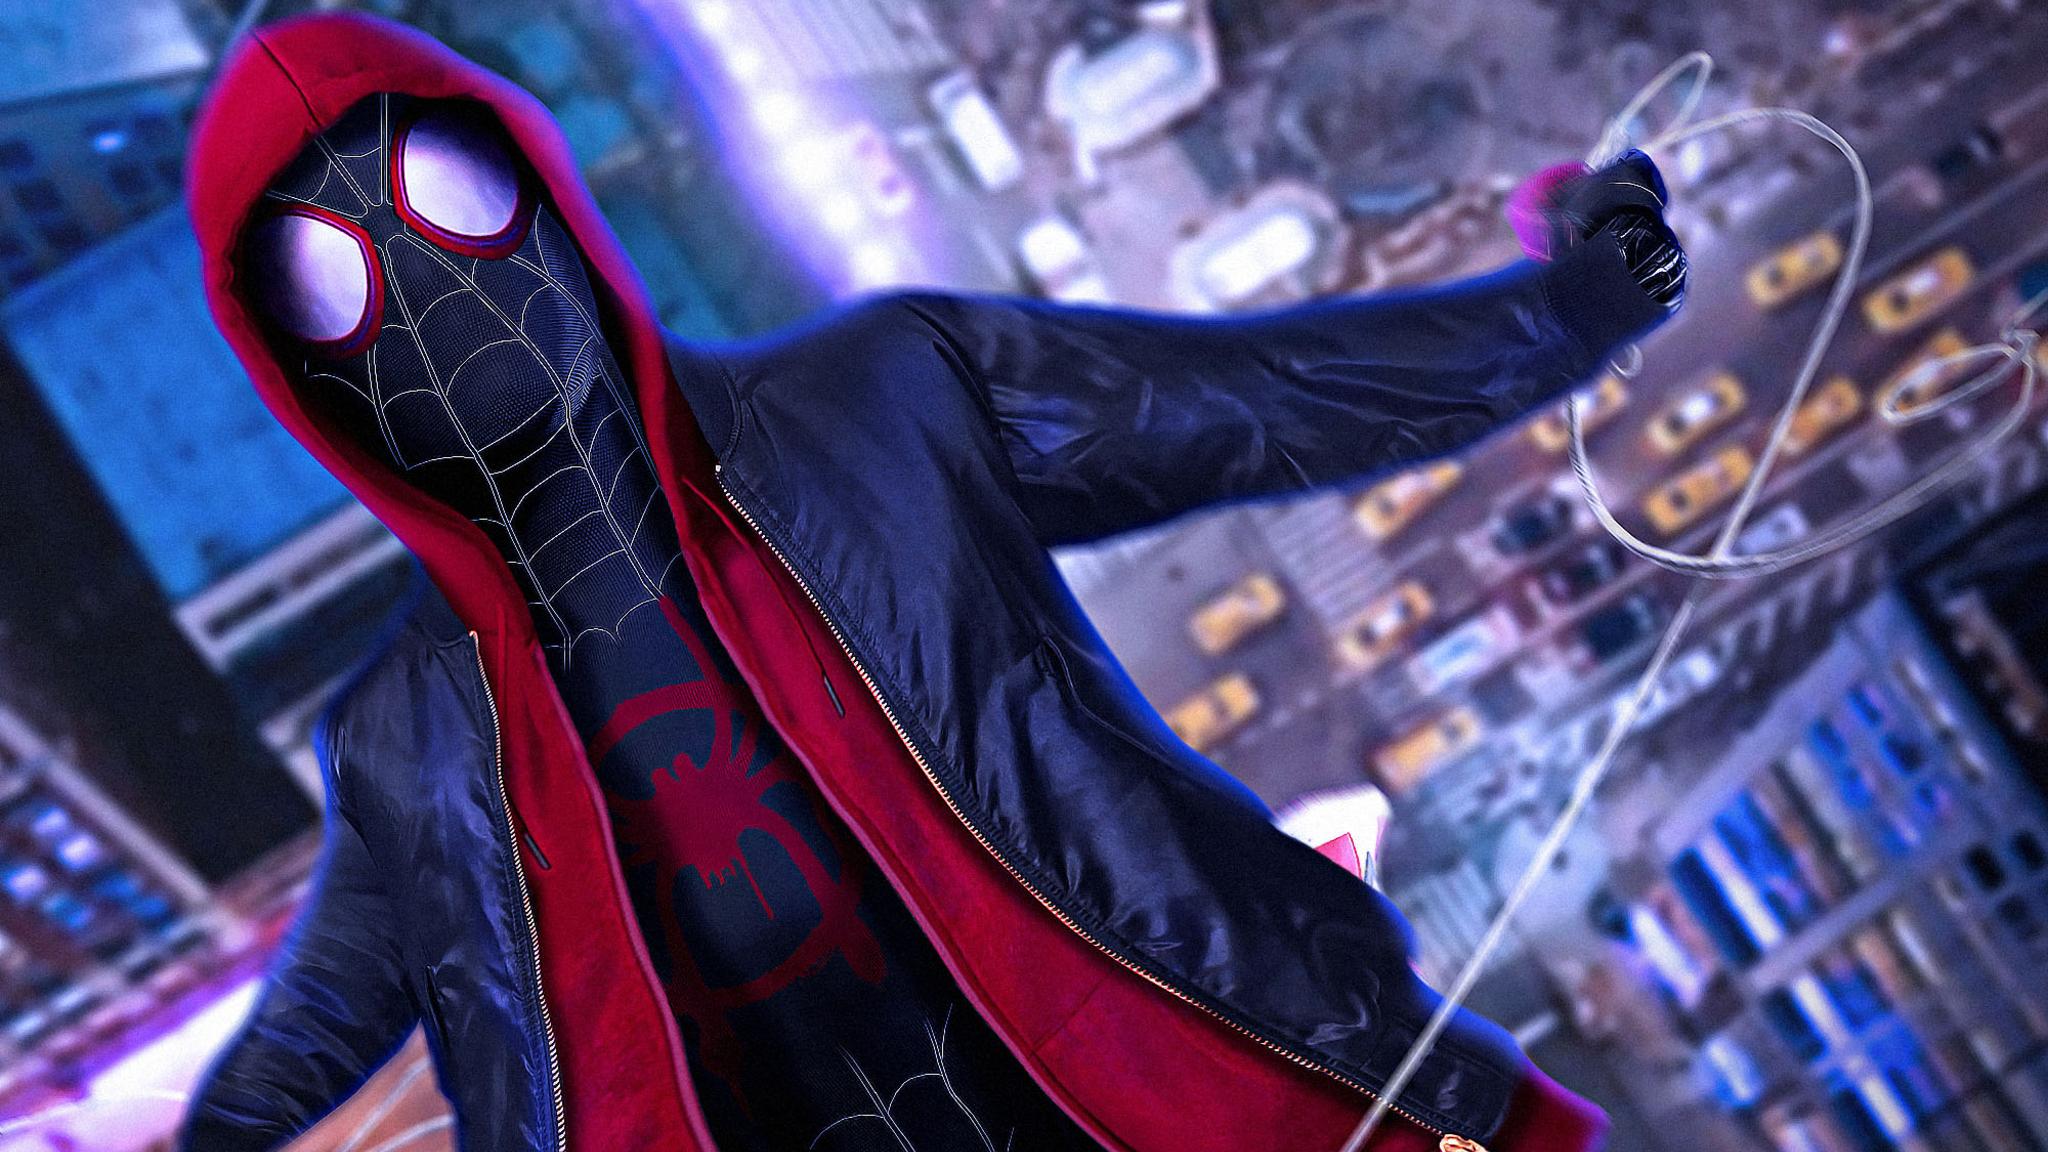 2048x1152 SpiderMan Into The Spider Verse Movie Cosplay